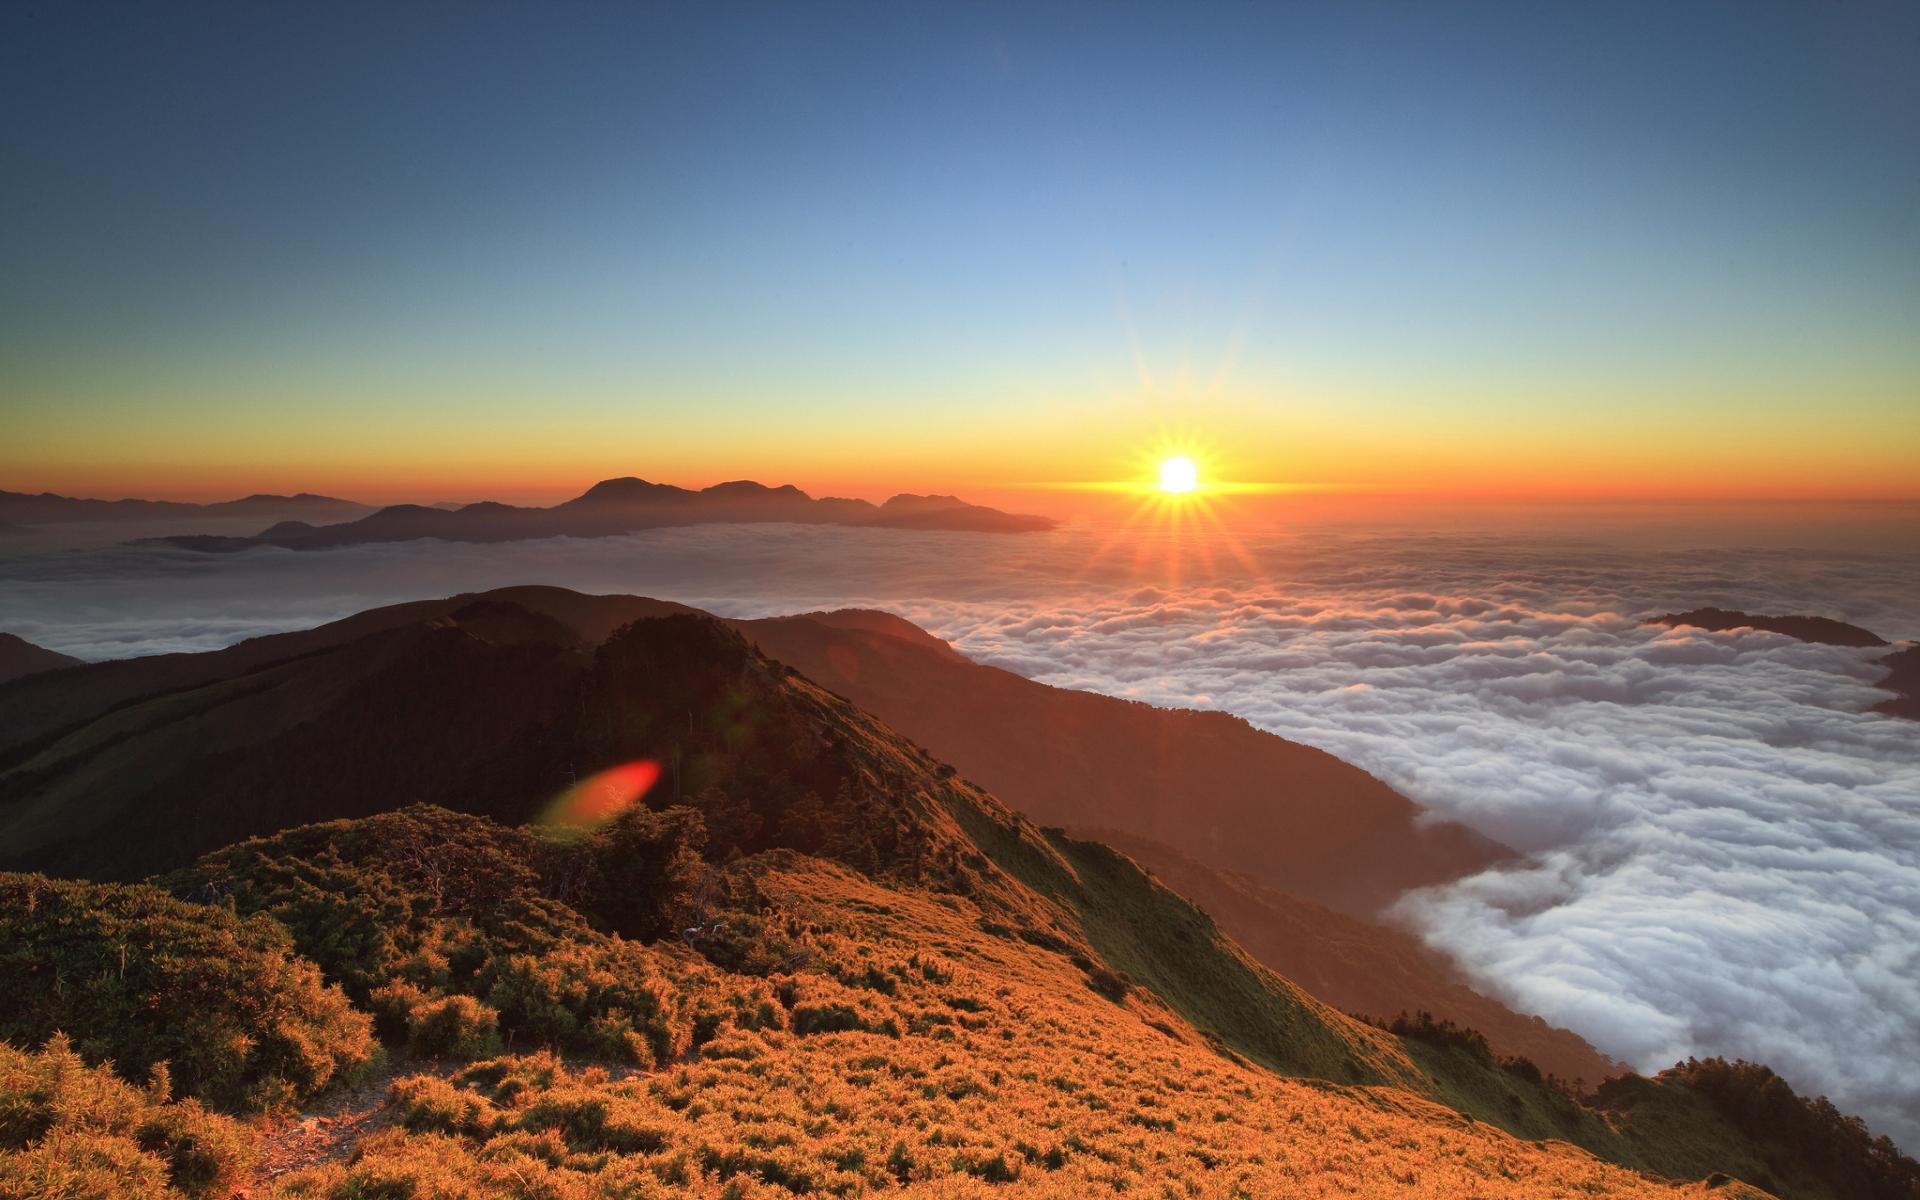 sunset images mountains panorama